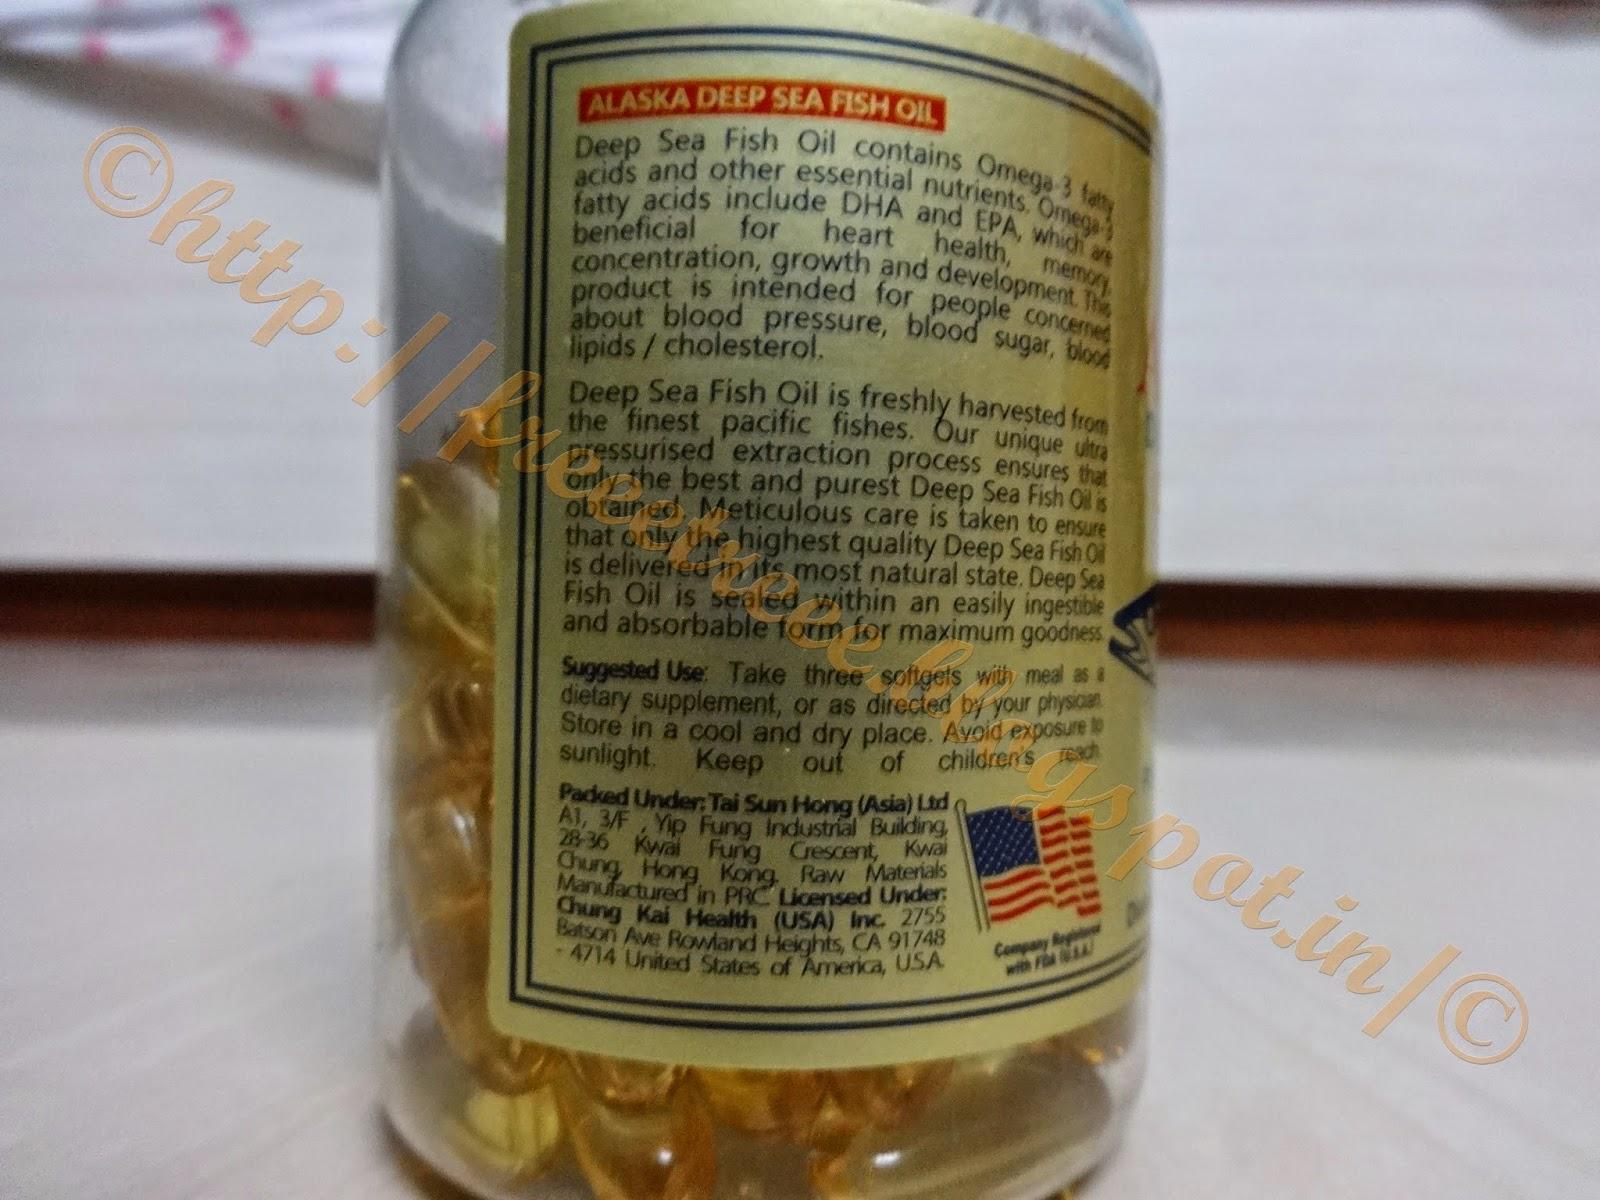 Sunline alaska deep sea fish oil omega 3 softgels review for Alaska deep sea fishing